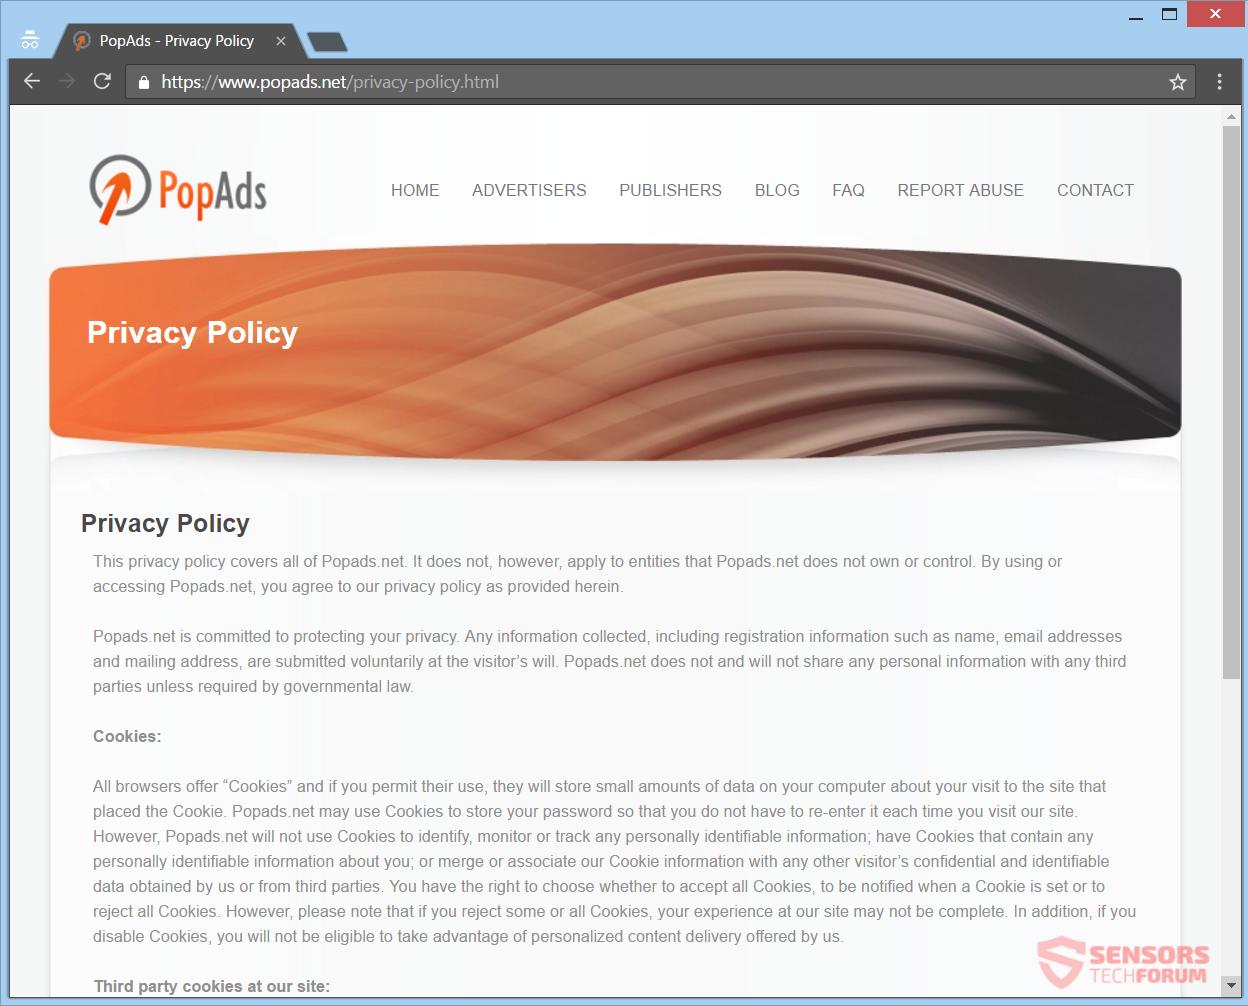 stf-popads-net-pop-ads-pop-up-ad-network-privacy-policy